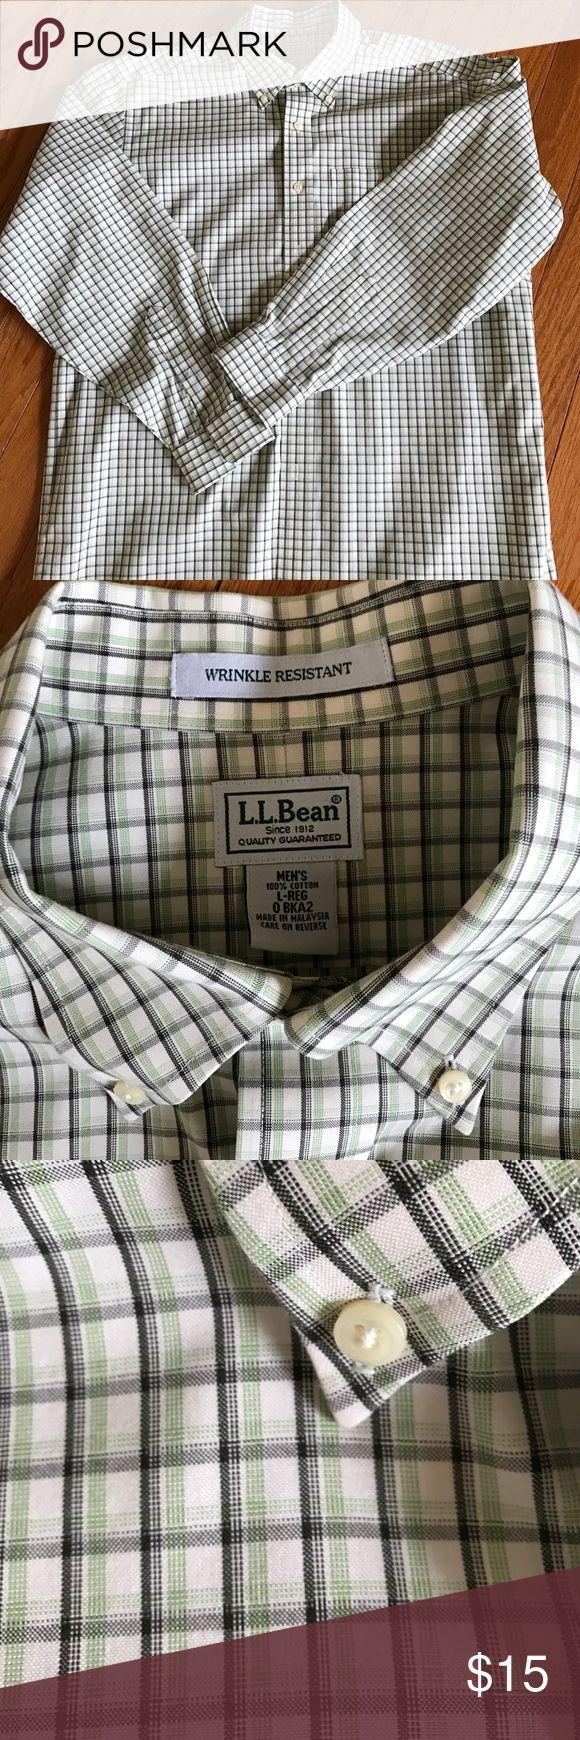 Men's casual button down shirt LL Bean Casual button down collar plaid shirt. Neck 16.5 sleeve 32-33 like new excellent condition LLBean Shirts Casual Button Down Shirts